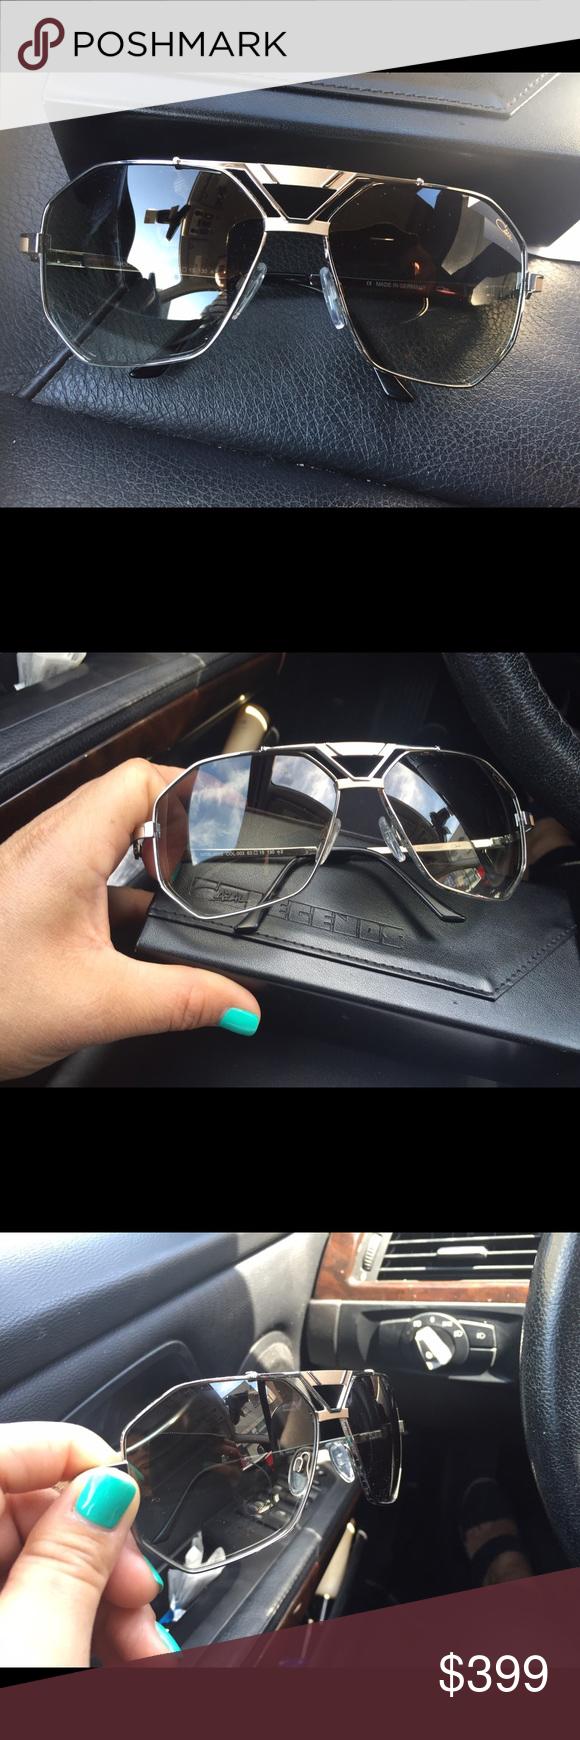 510ab56de826 Cazal Sunglasses Cazal 9058 Sunglasses brand New with case Cazal  Accessories Glasses